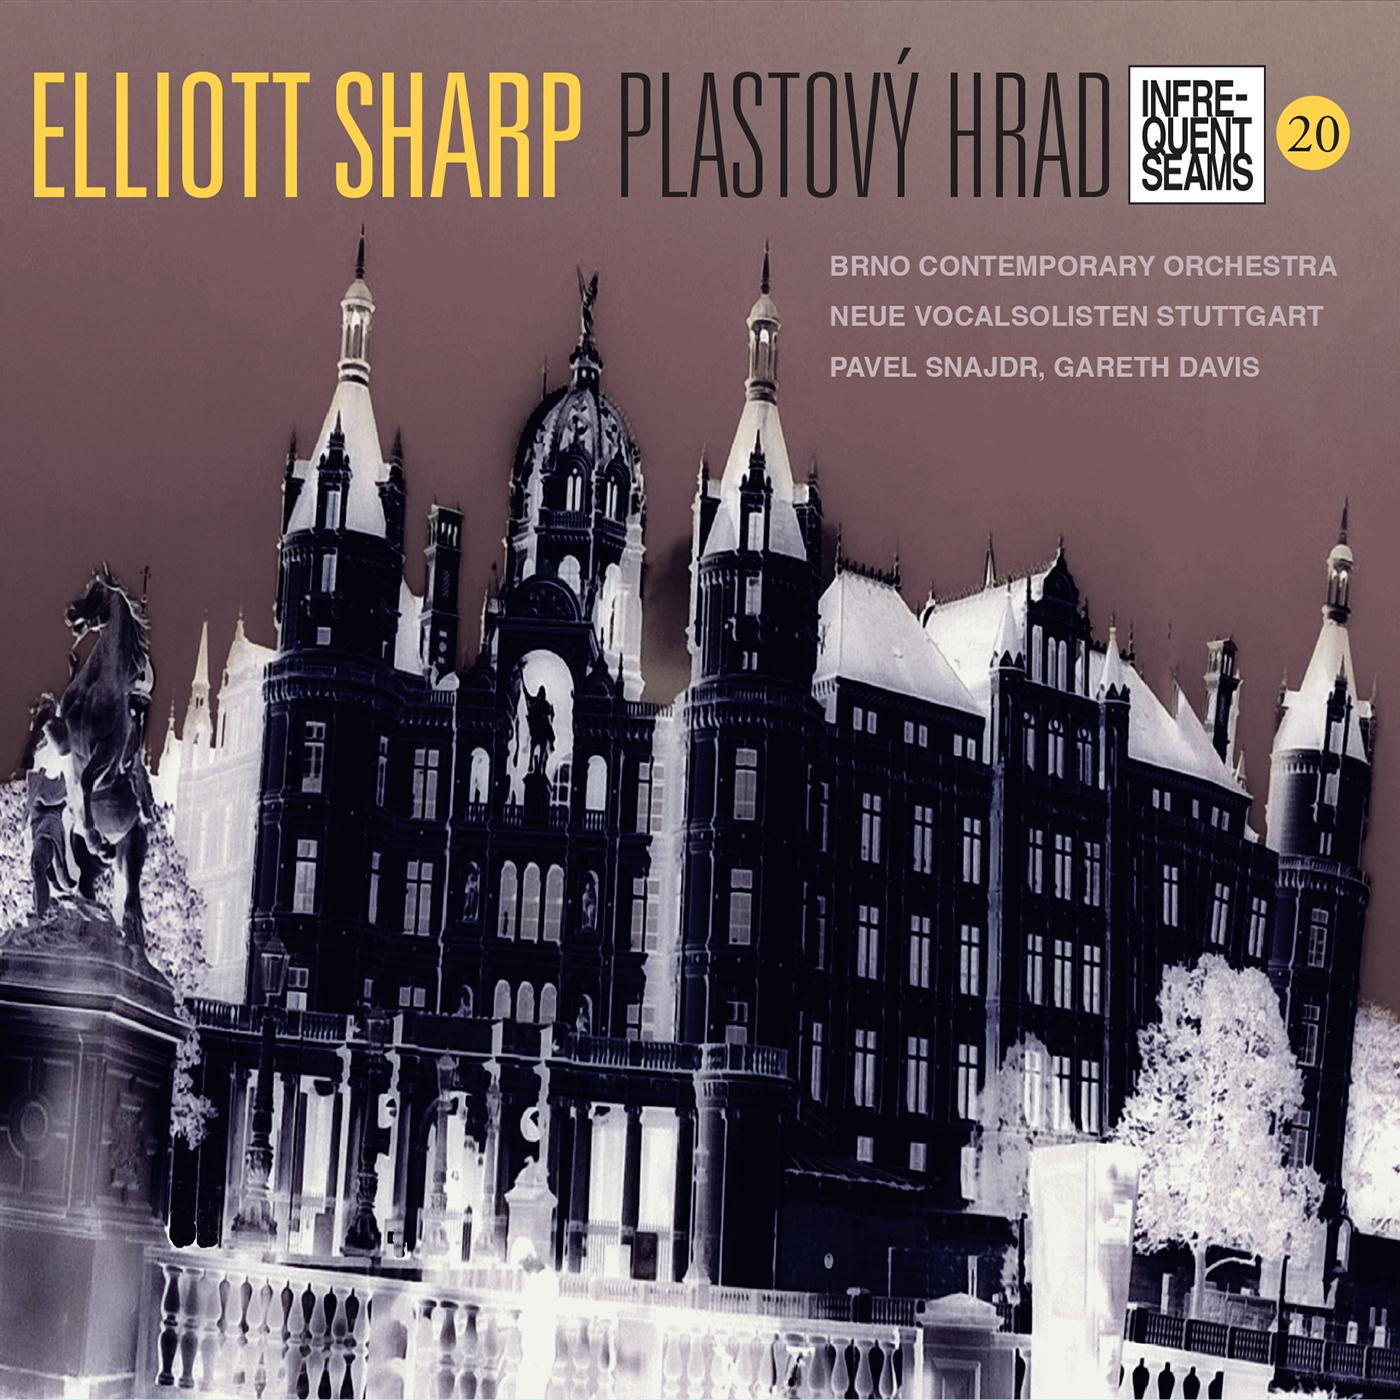 Sharp_Plastovy_Hrad_COVER_1400x1400_James_Ilgenfritz